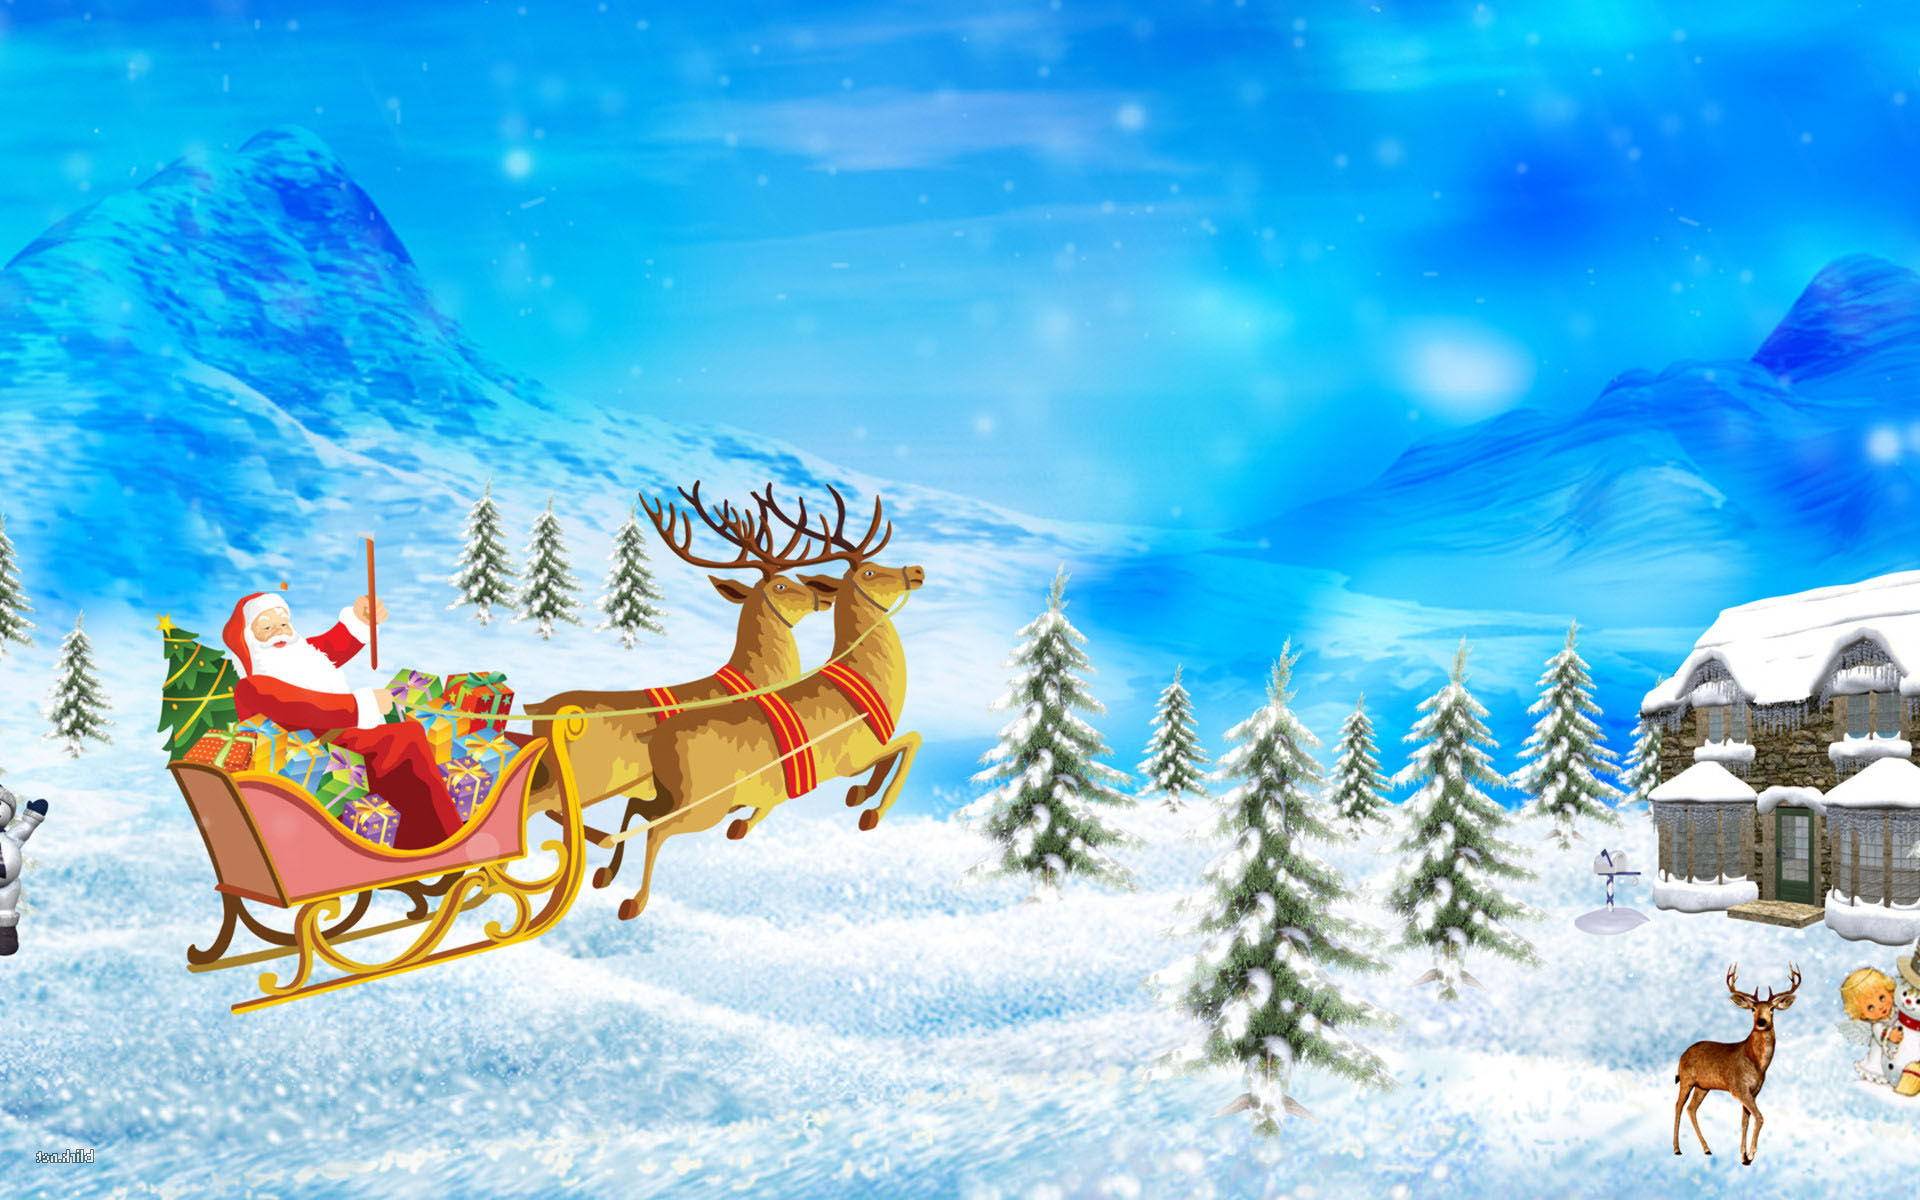 Fonds d'écran Père Noël 2015 - MaximumWallHD